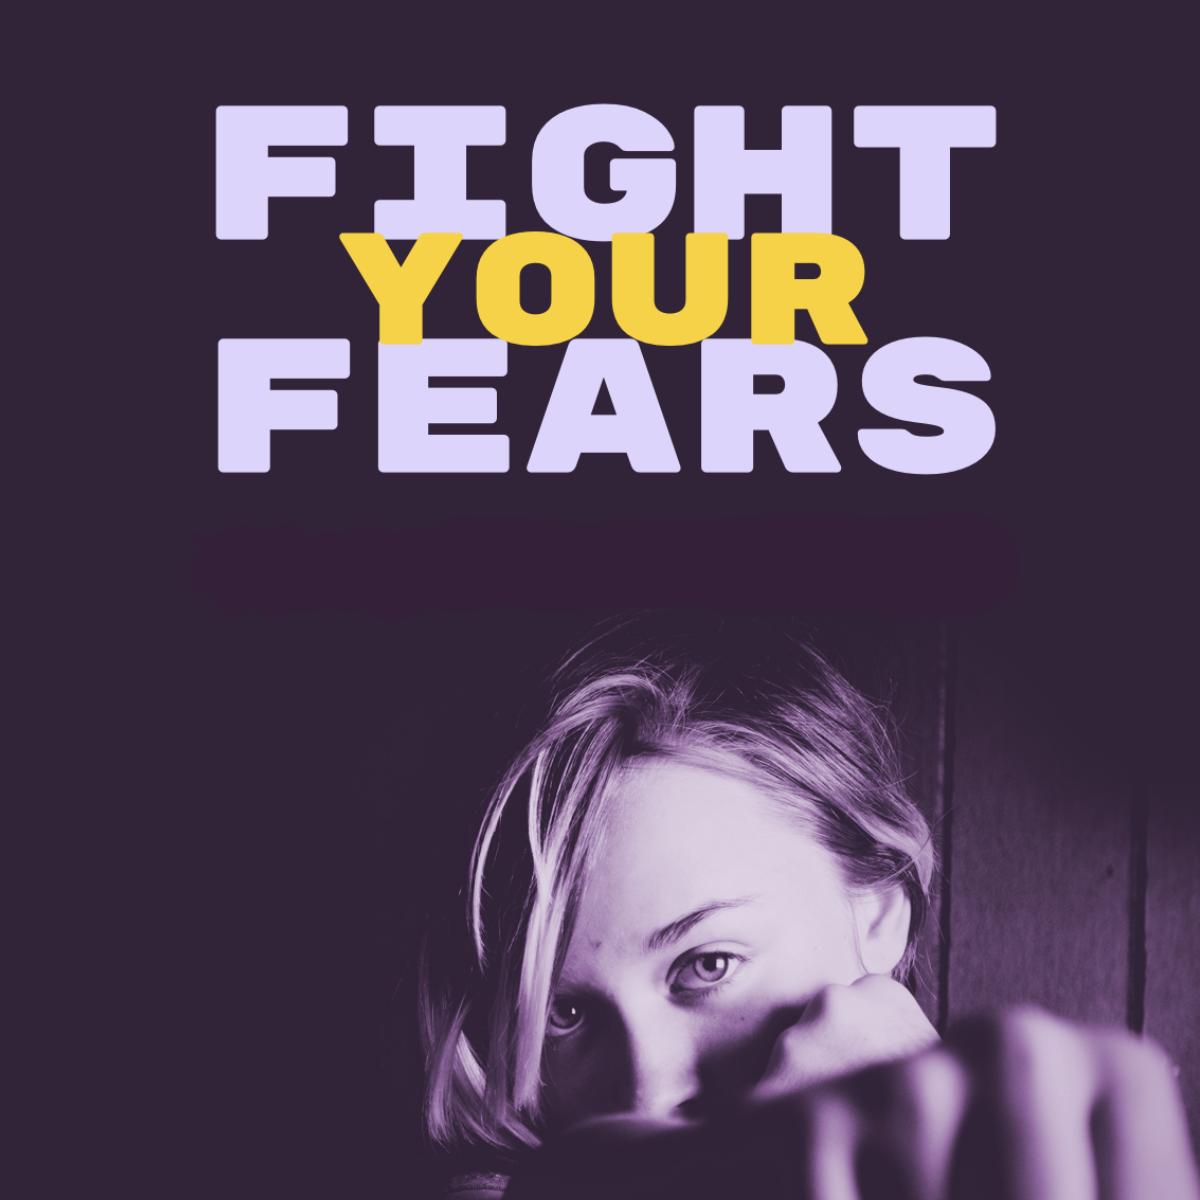 fight-fear-worry-seminar